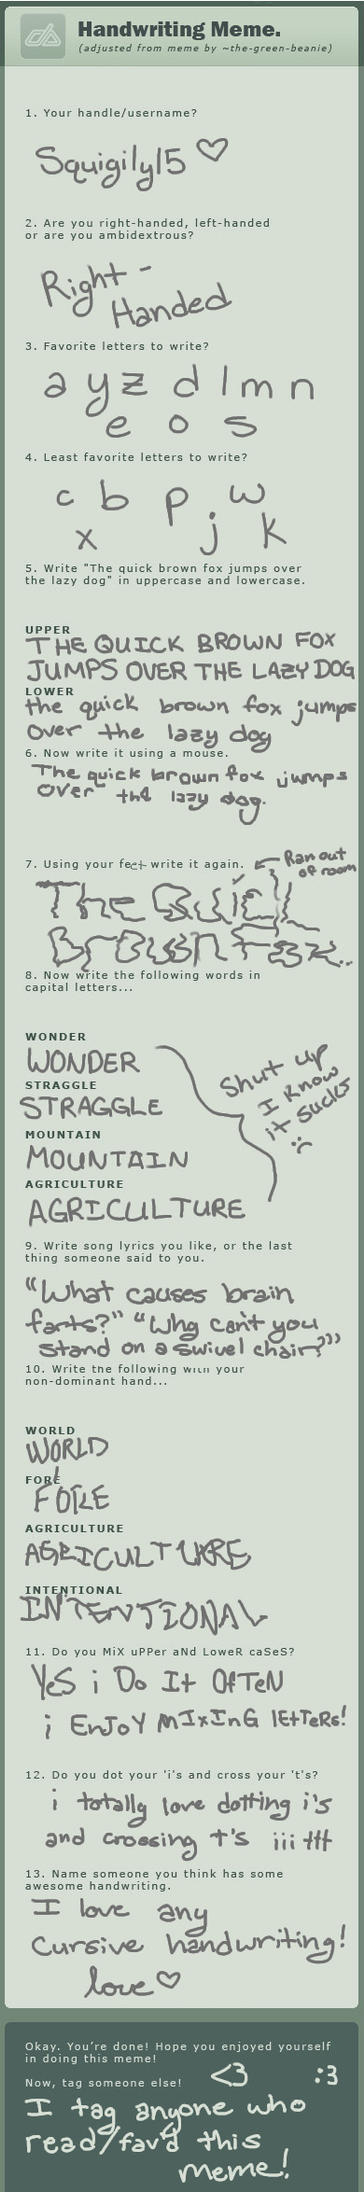 Handwriting Meme by Squigily15